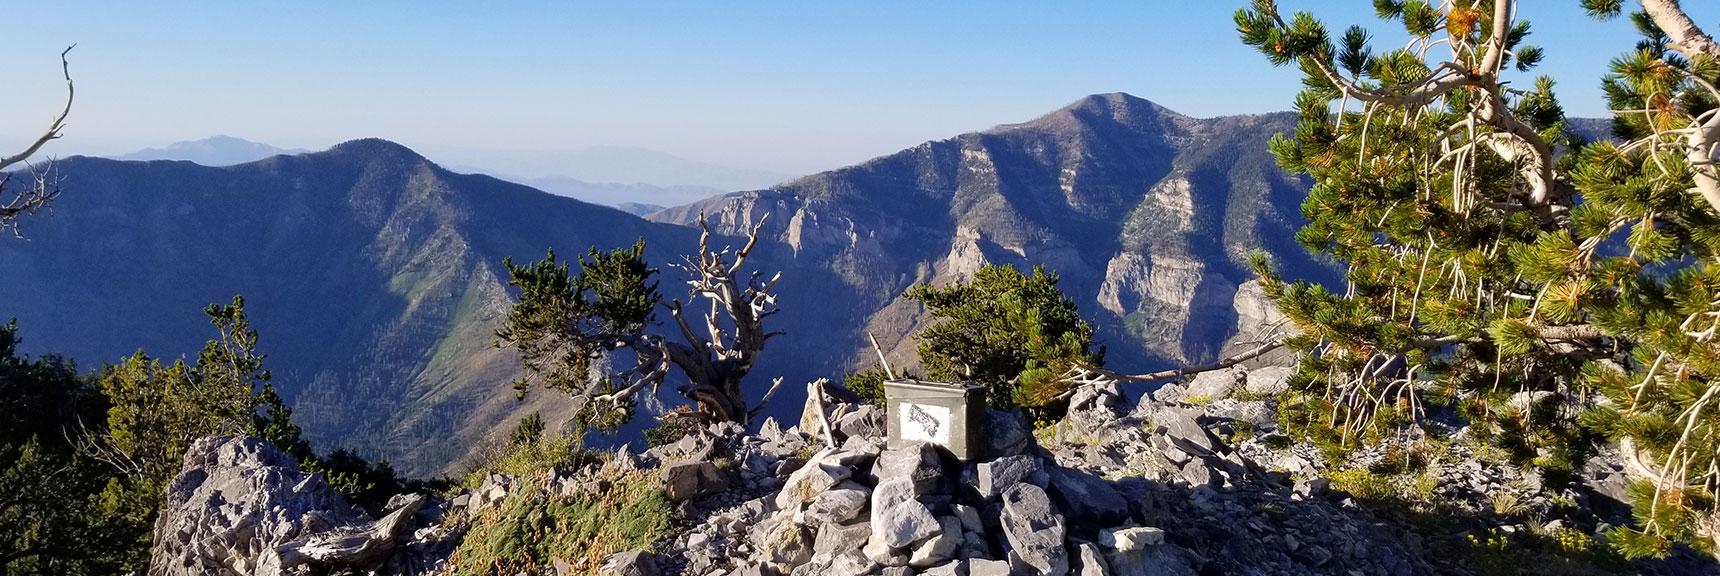 Early Morning on Fletcher Peak Summit in Mt. Charleston Wilderness, Nevada